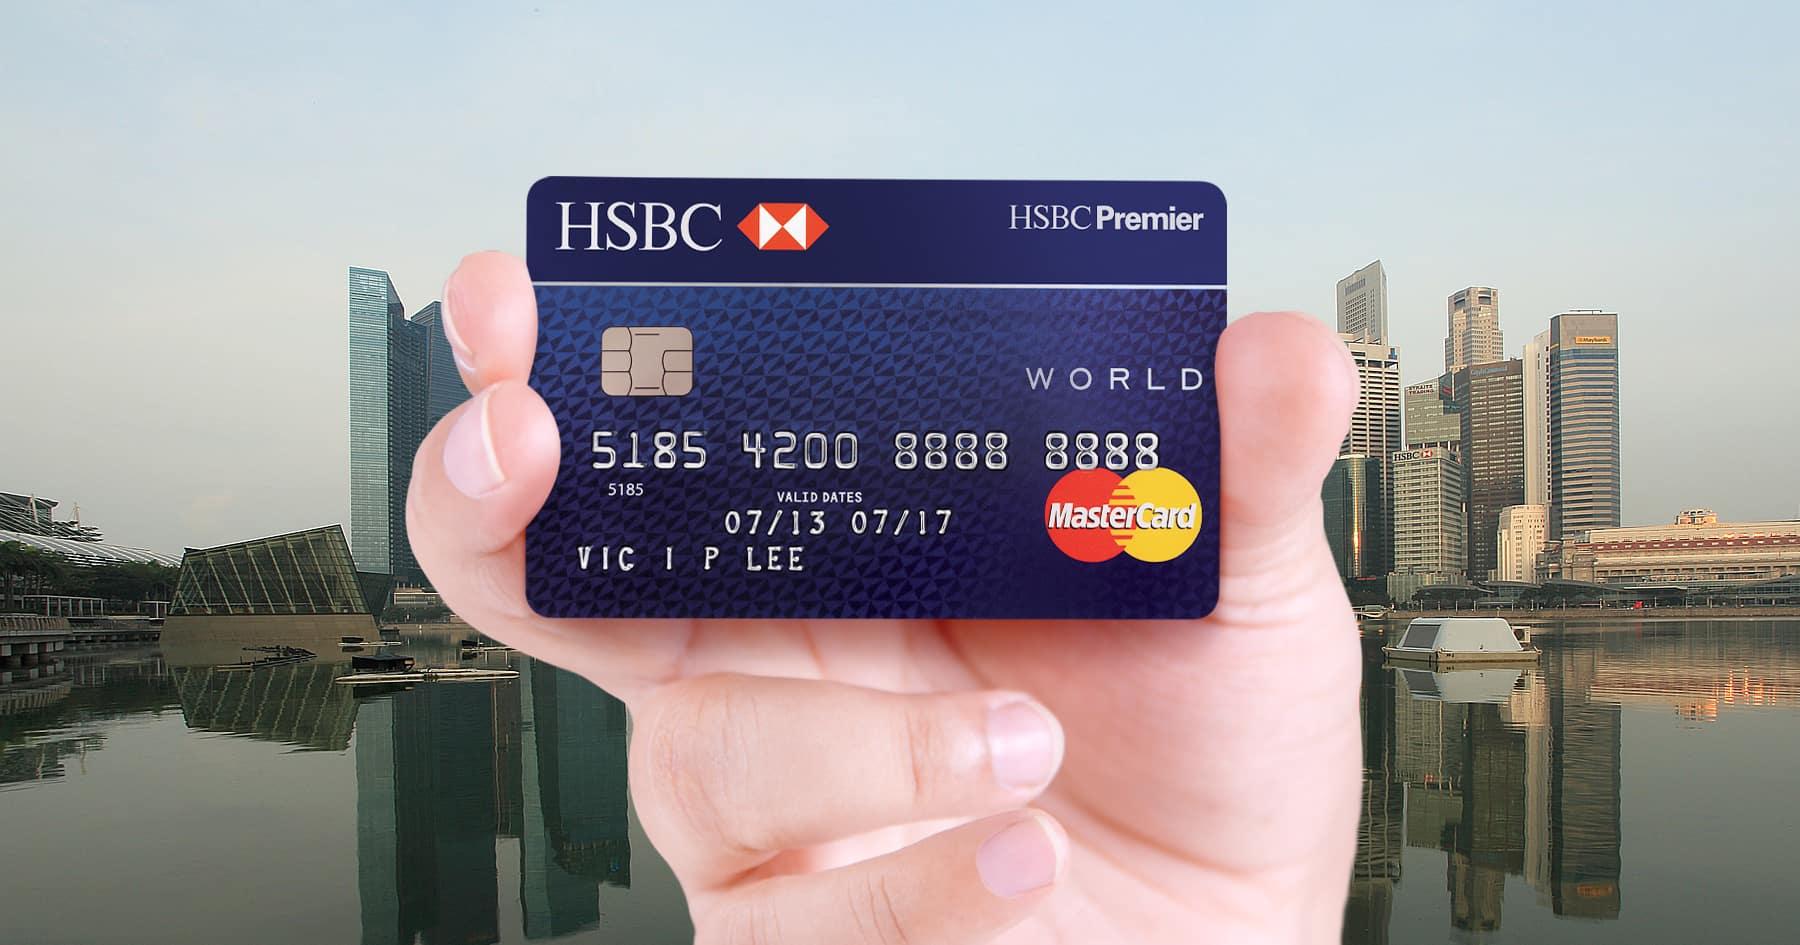 7 Top Advantages of HSBC Premier MasterCard Credit Card